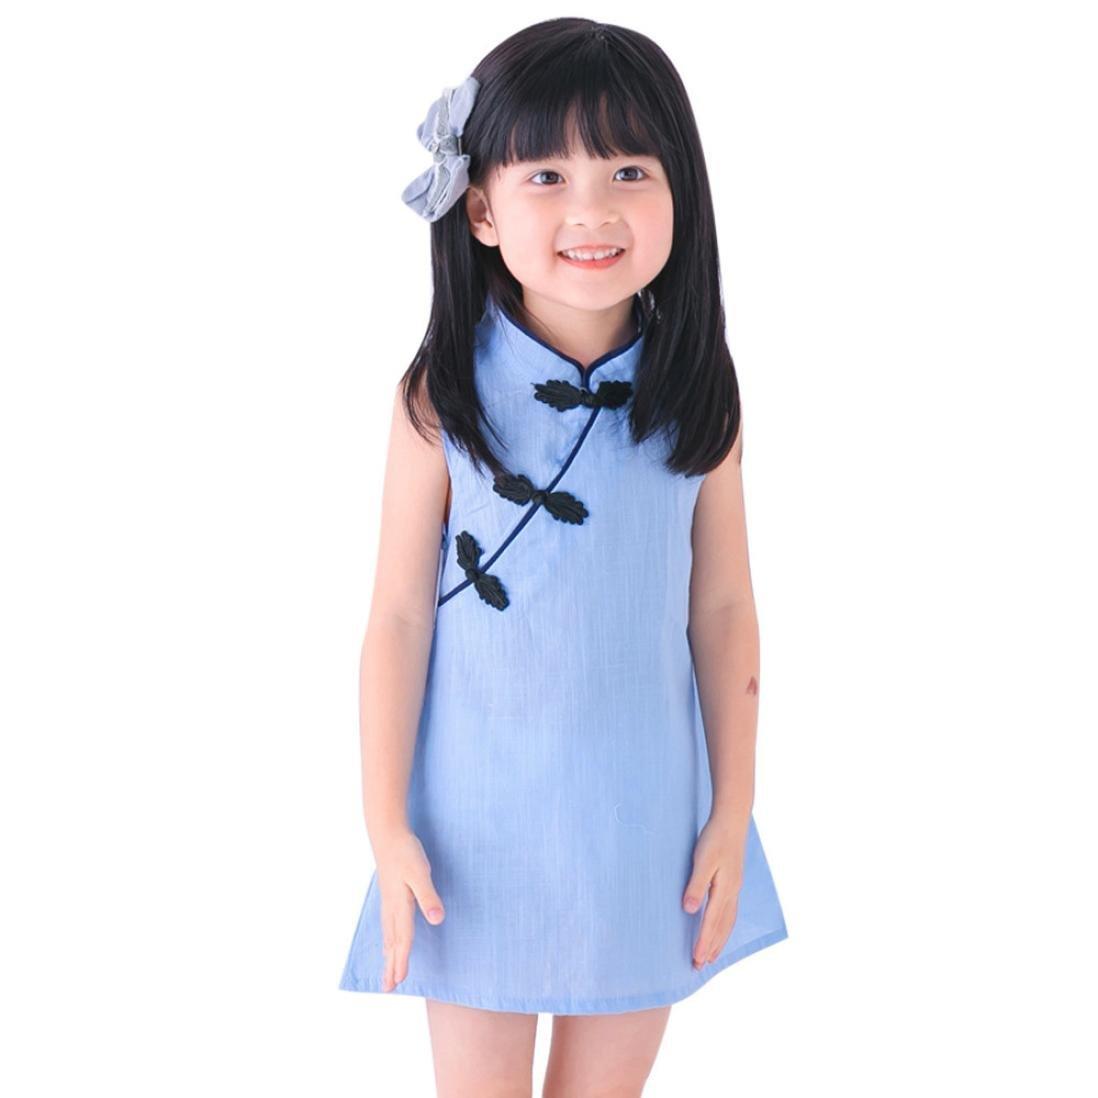 2da2f121a Amazon.com: Misaky Kids Girls Qipao Princess Dress Wedding Chinese Cheongsam:  Clothing